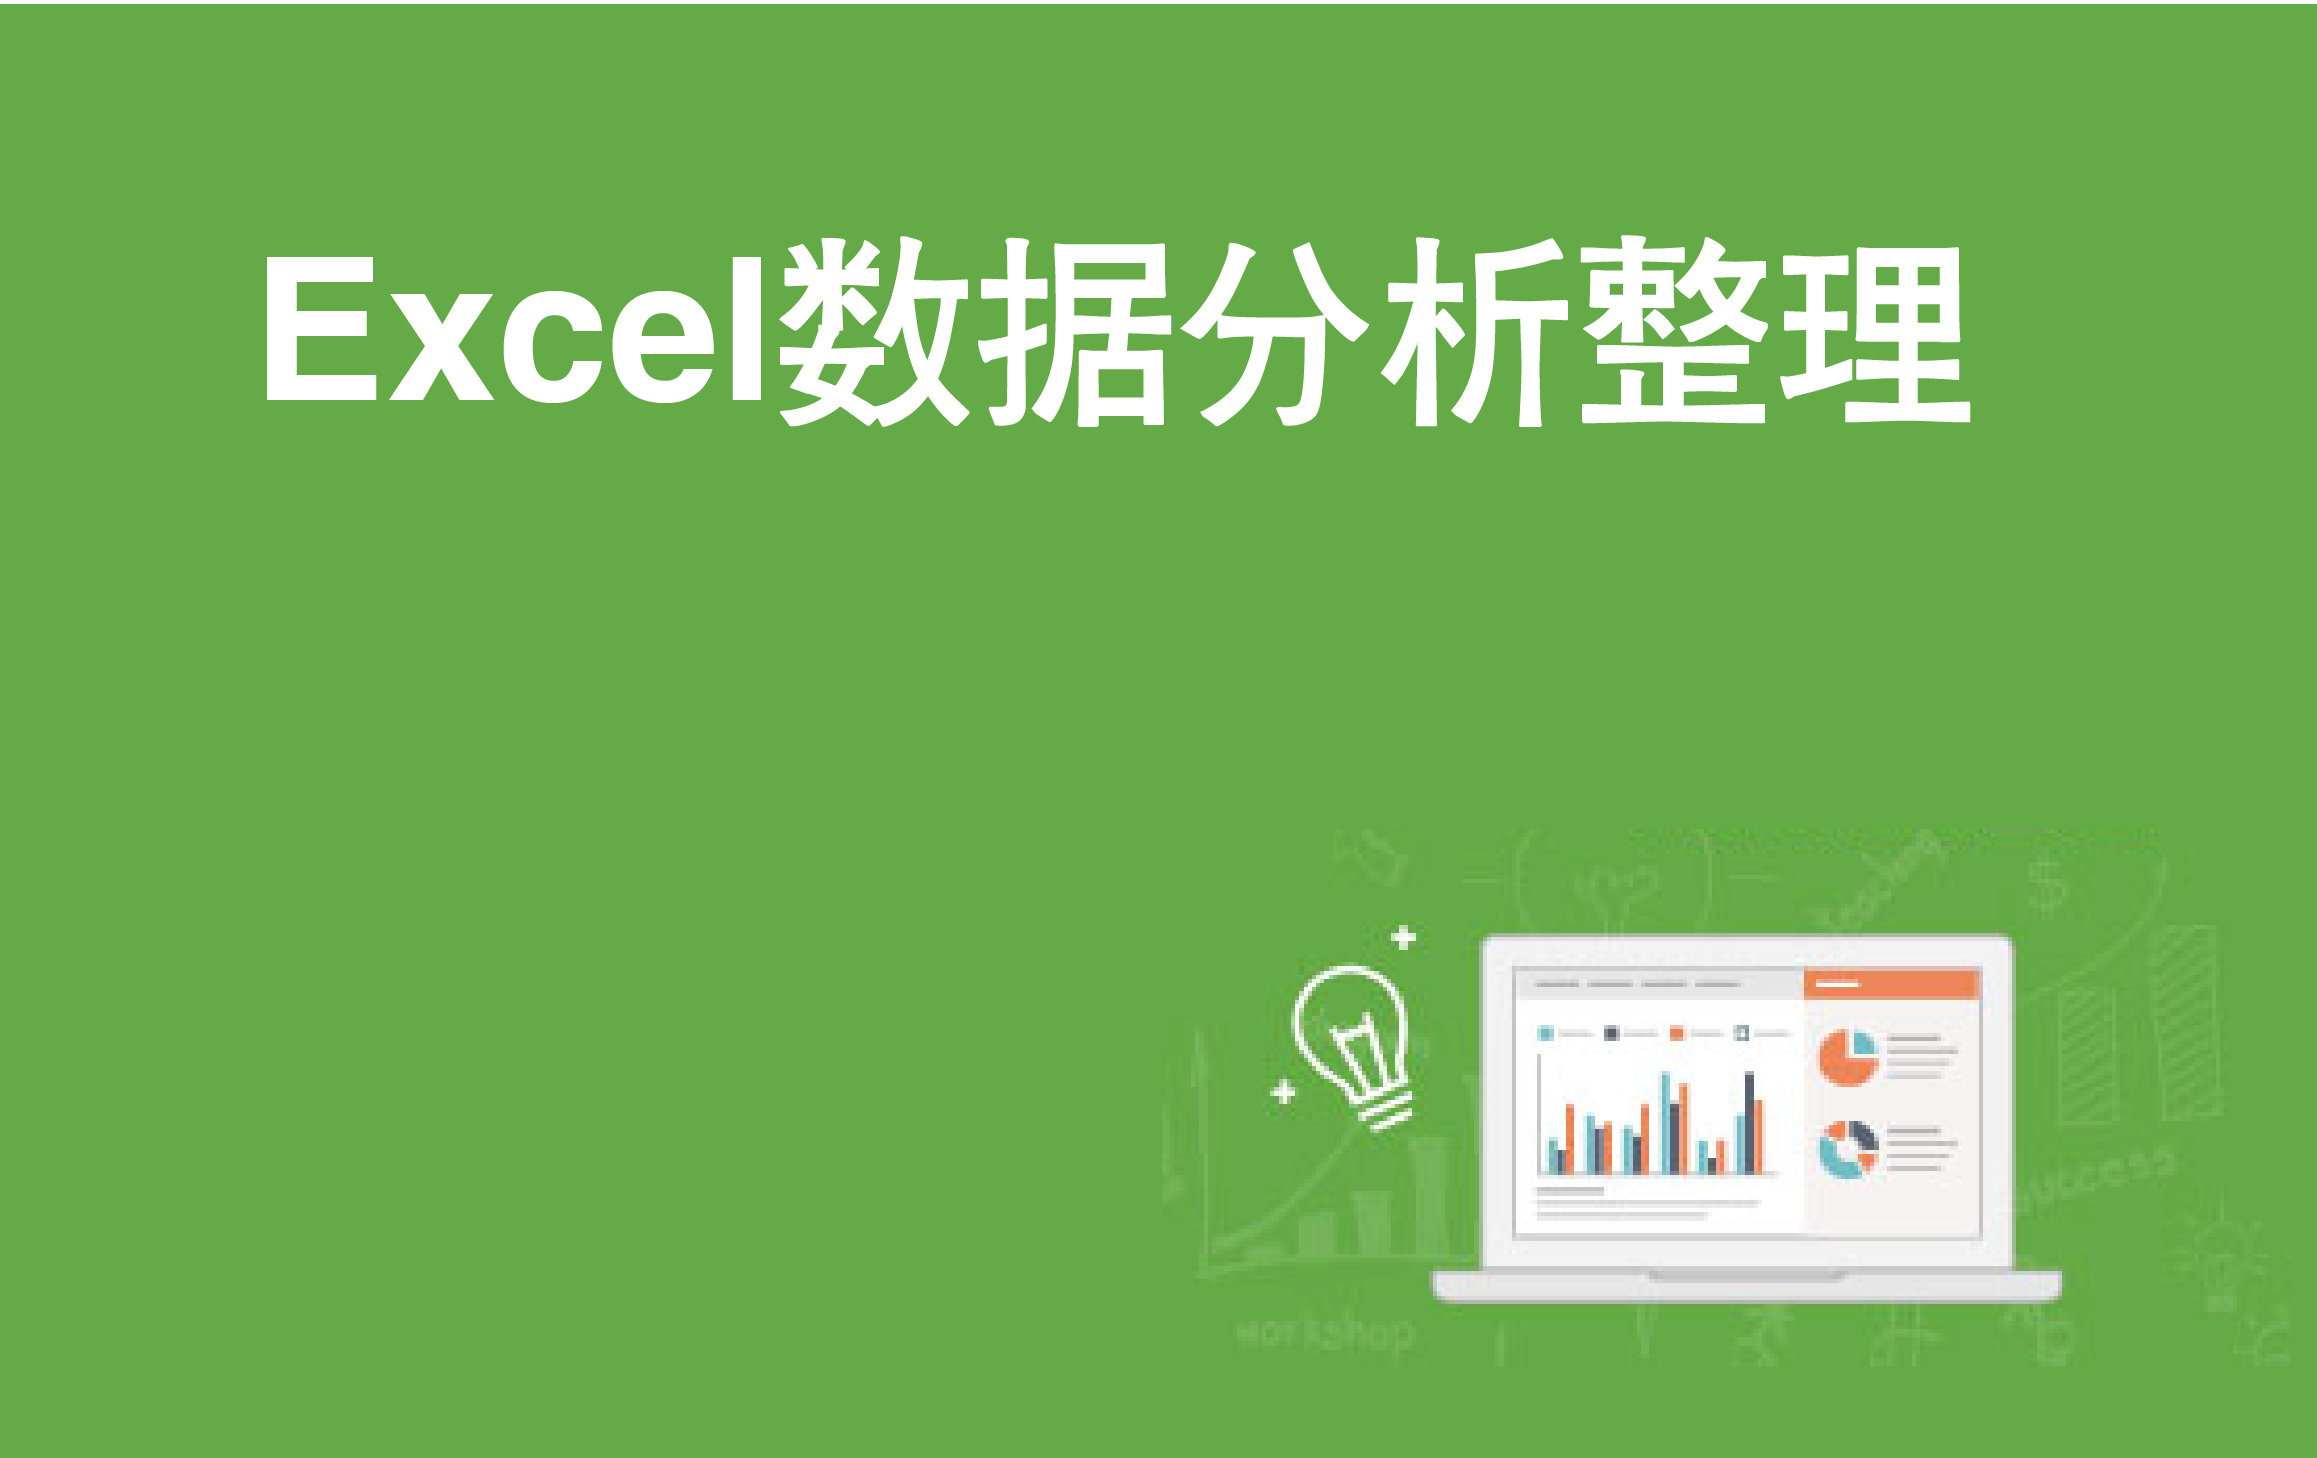 Excel中汇报销售数据的图表制作技巧